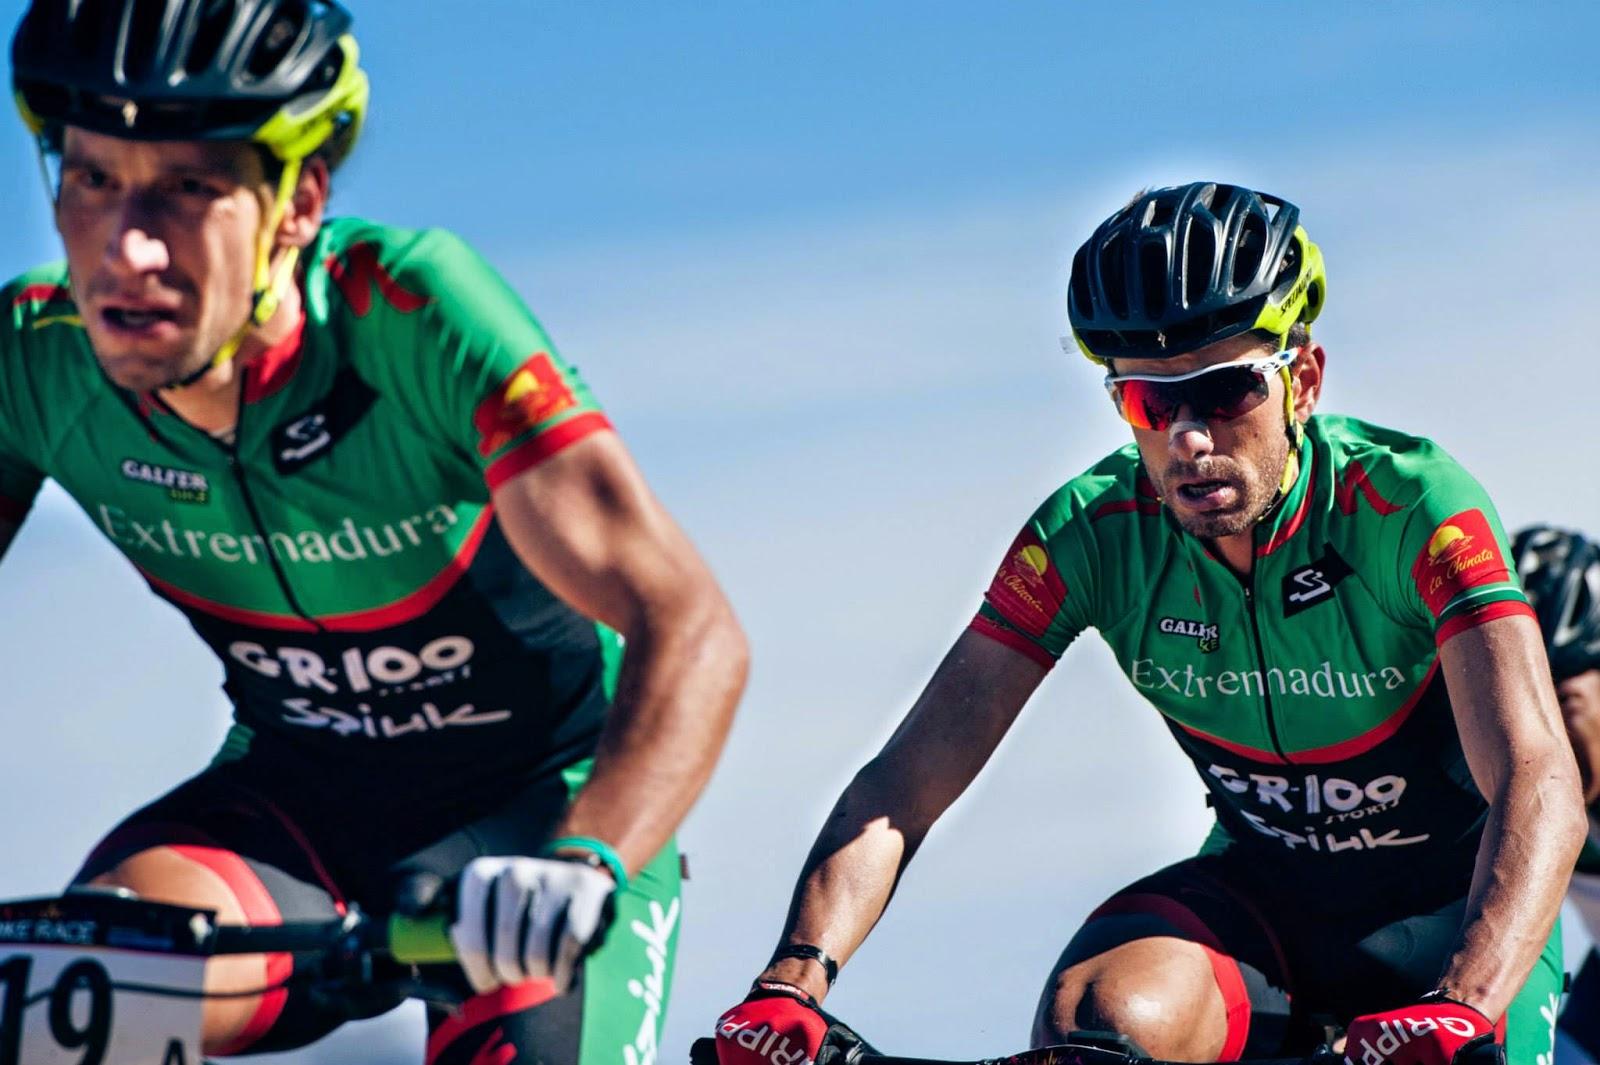 ANDALUCIA BIKE RACE 2015